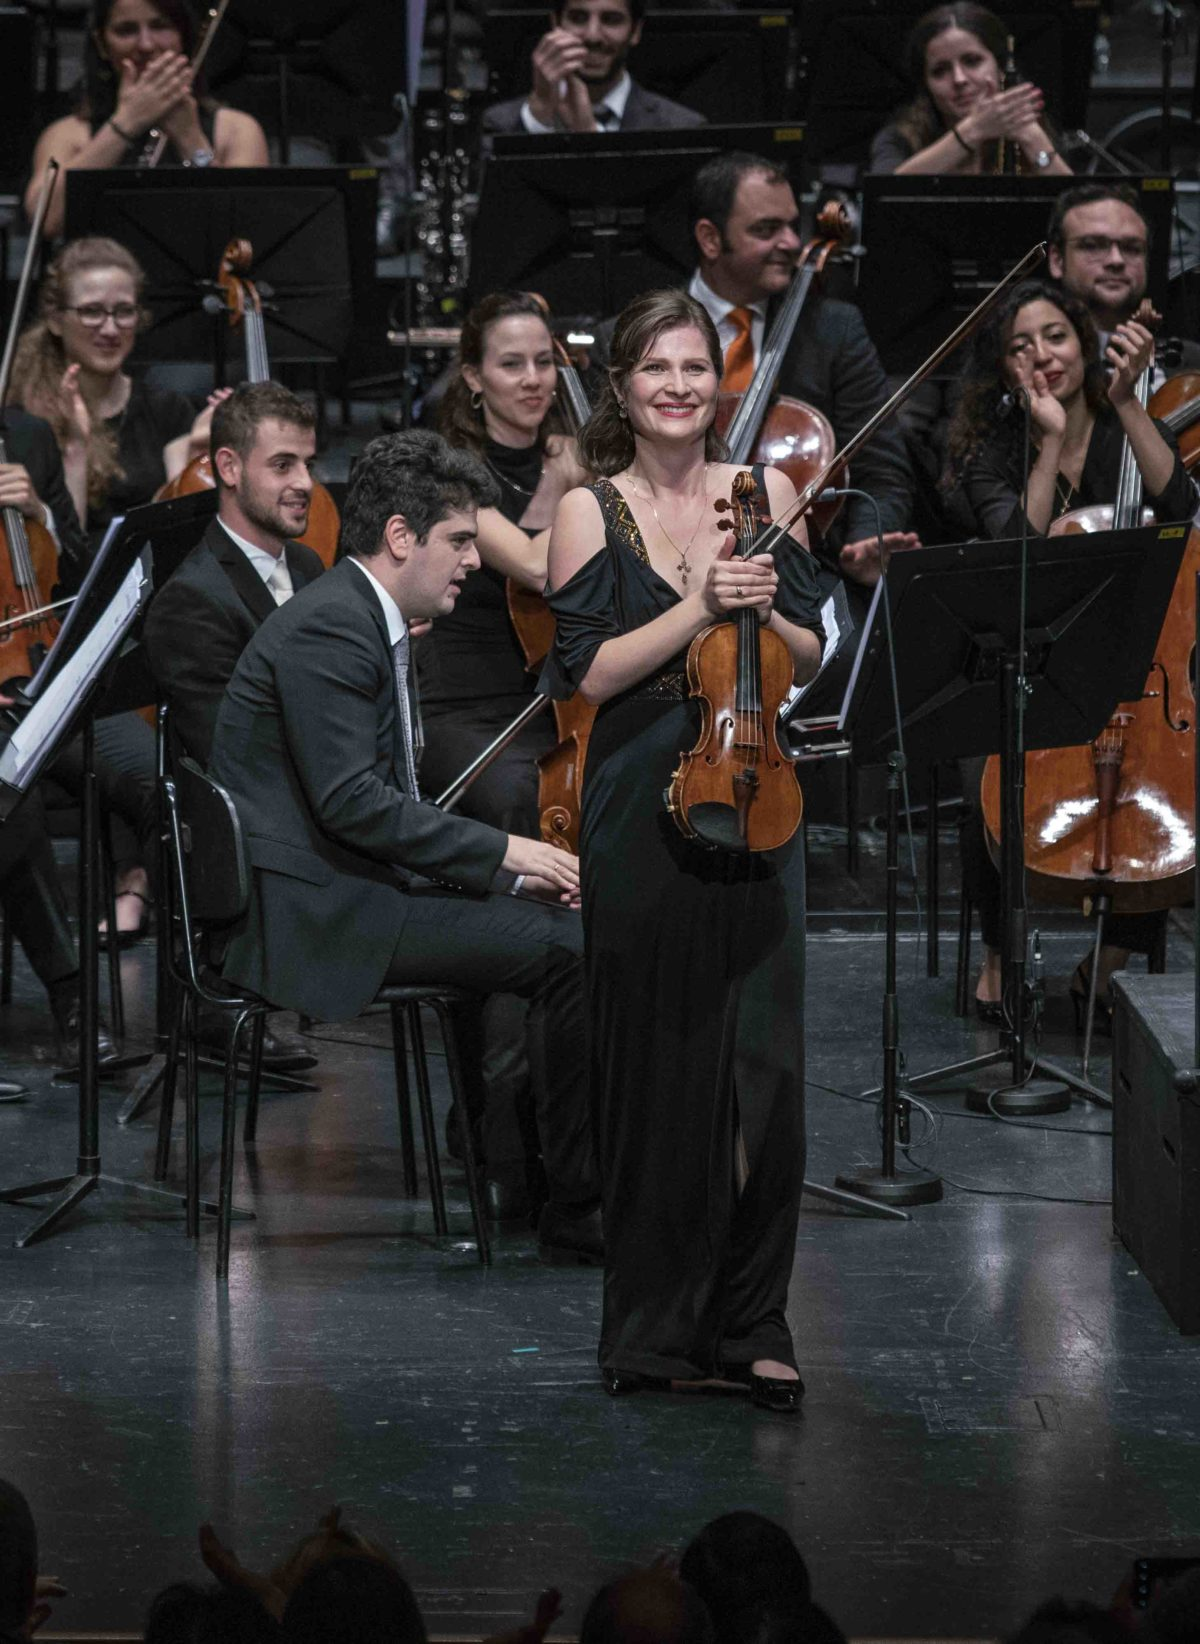 Lisa Batiashvili, Daniel Barenboim, West-Eastern Divan Orchestra,  Salzburger Festspiele, Großes Festspielhaus